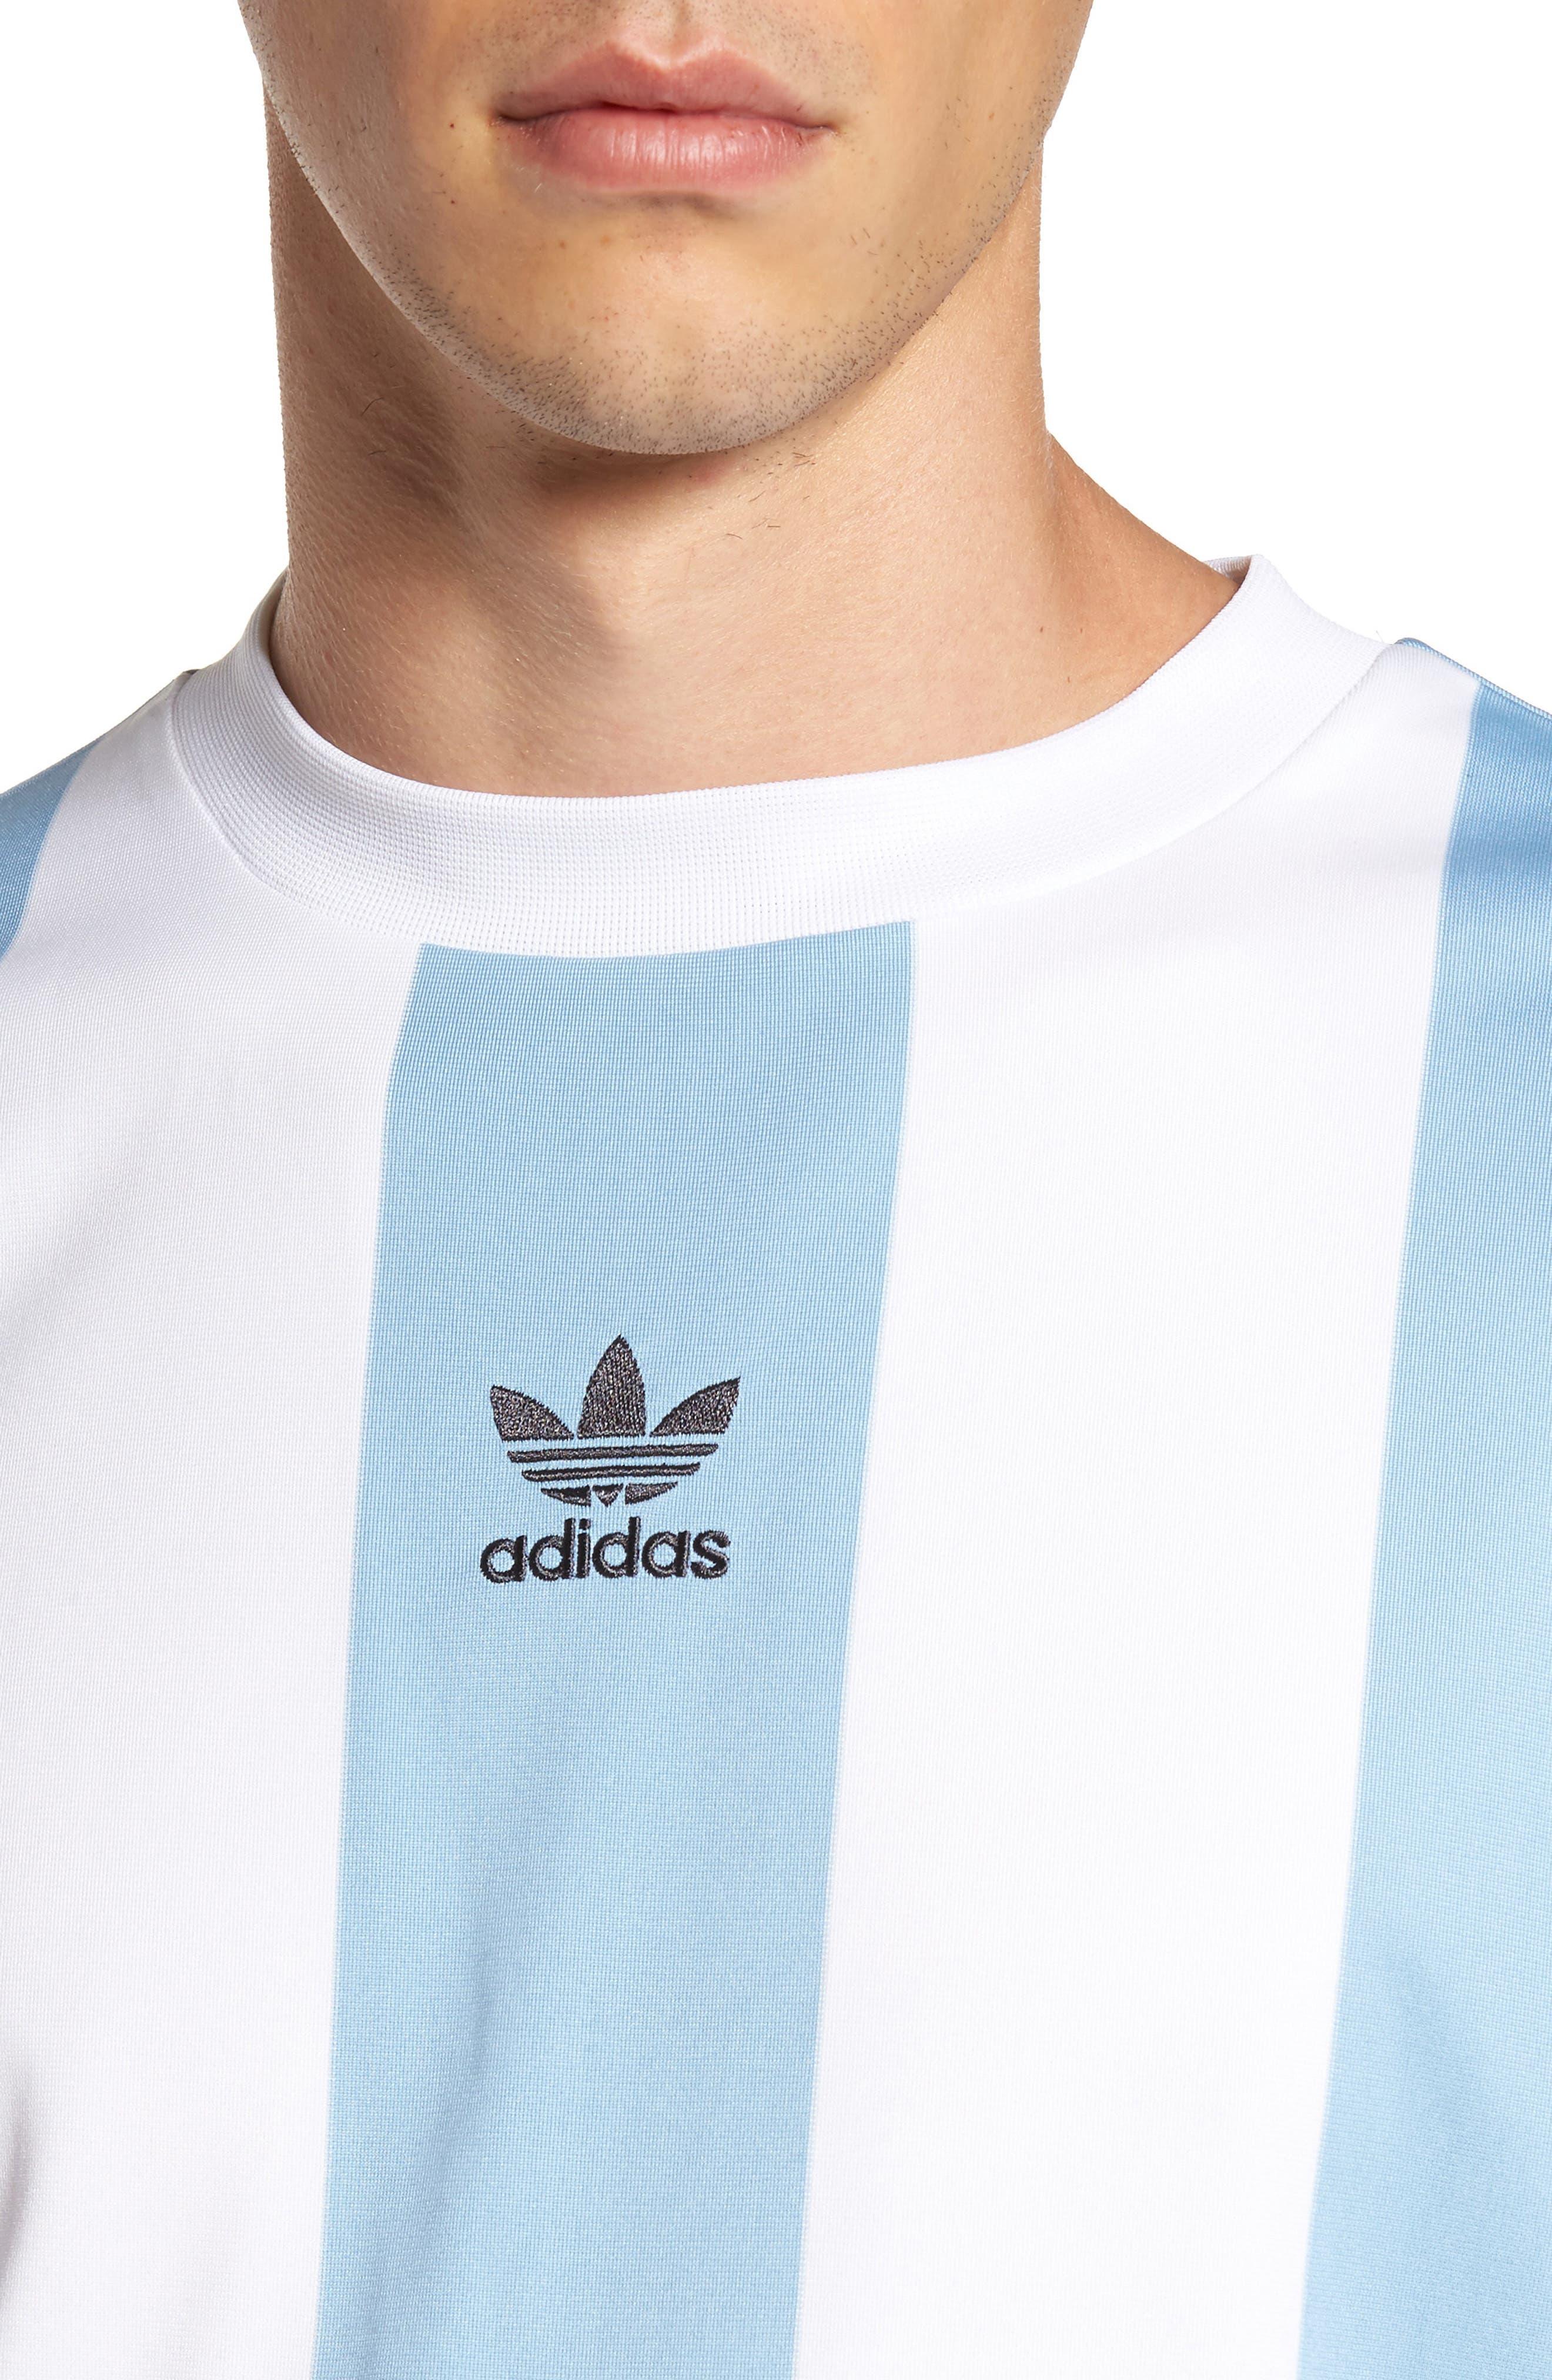 Originals Rival Goalie T-Shirt,                             Alternate thumbnail 4, color,                             Ash Grey/ White